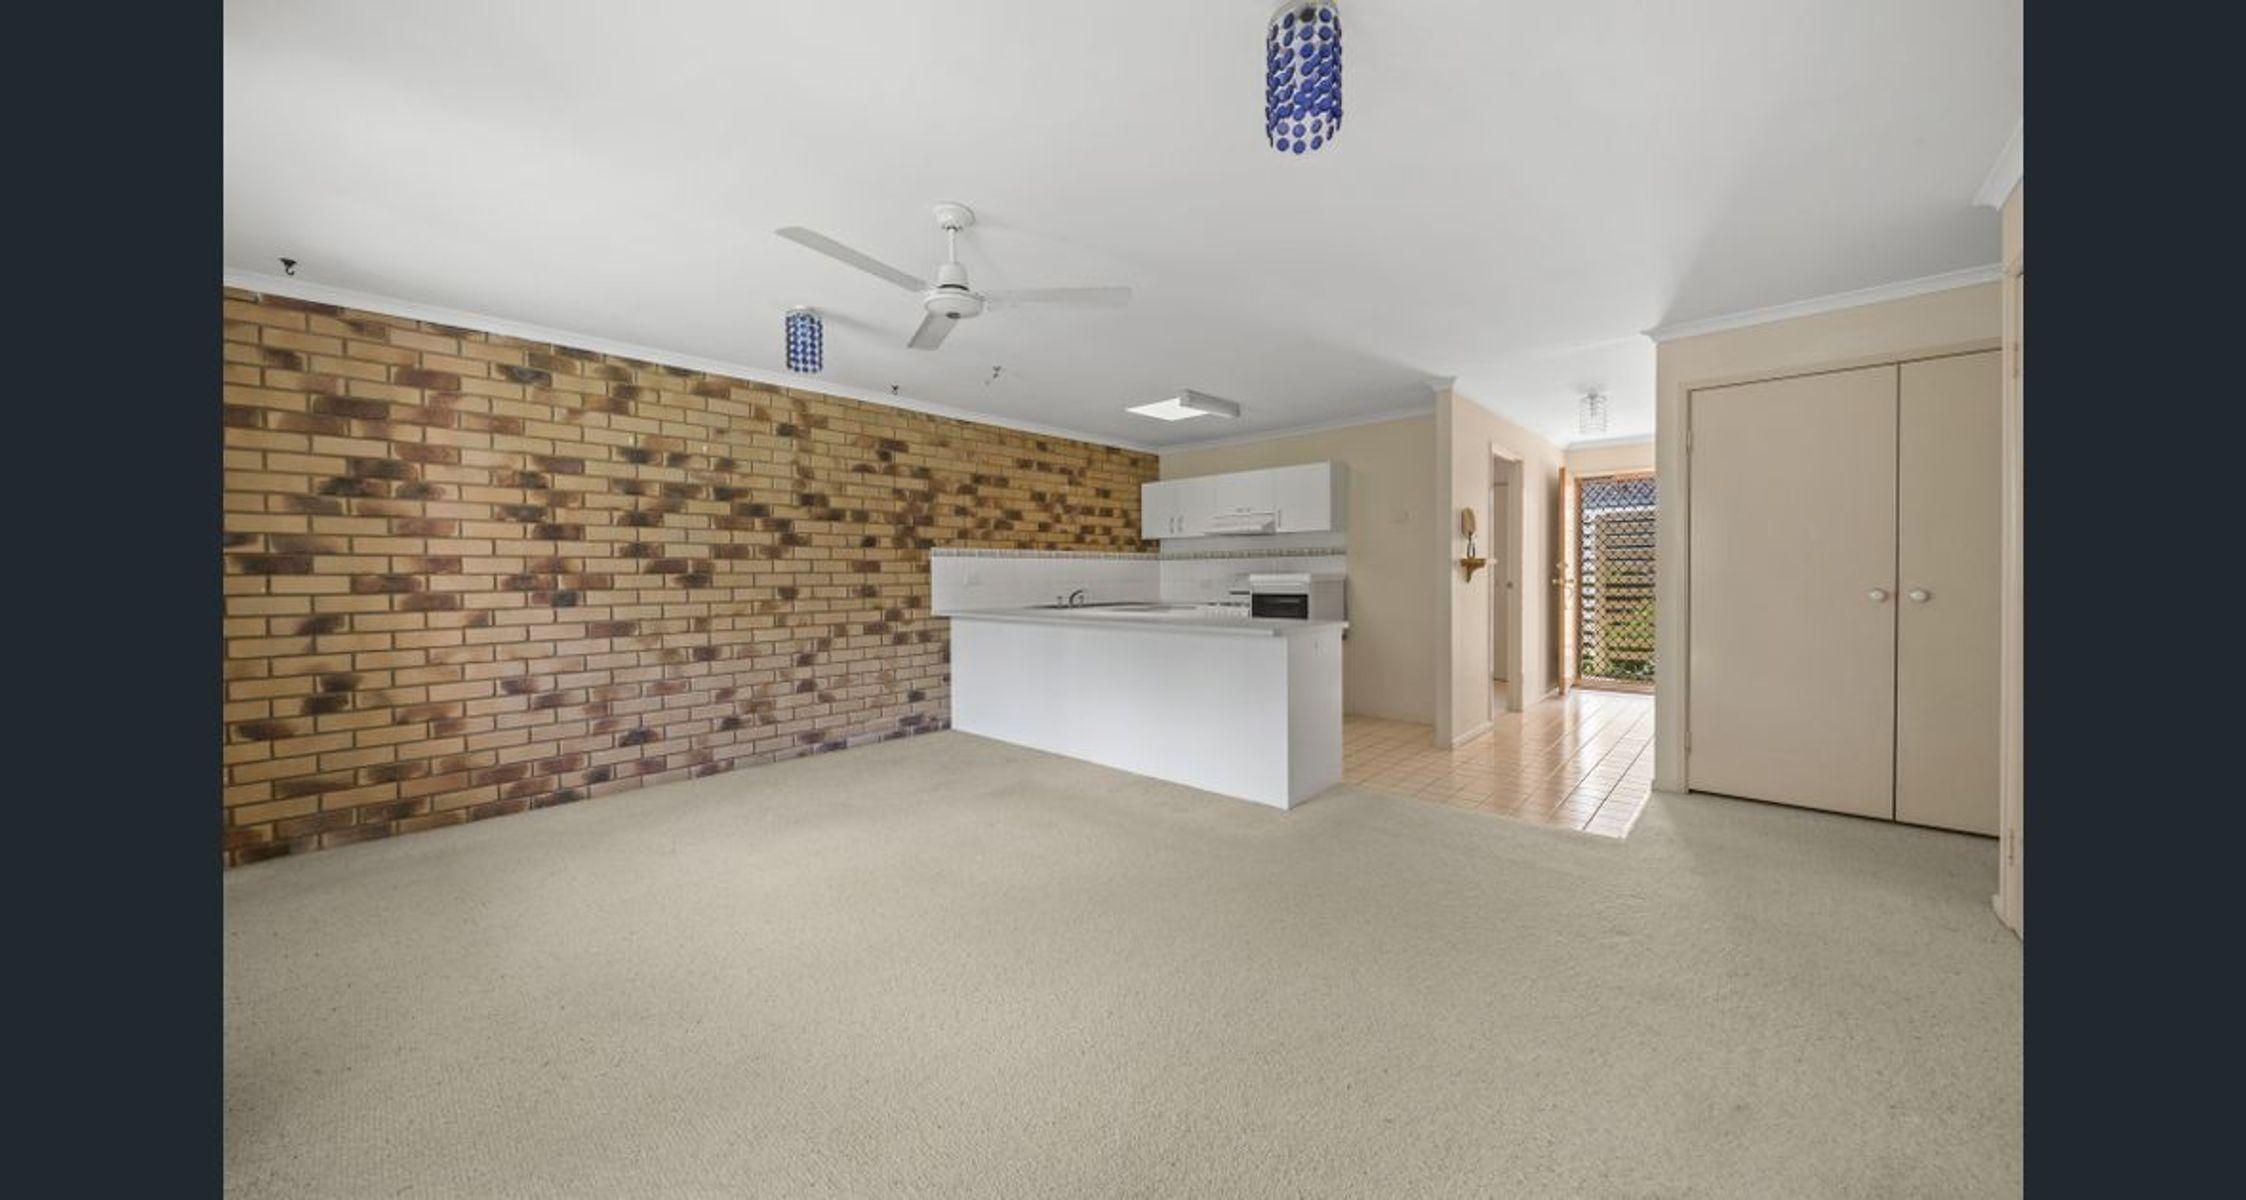 36/18 Doolan Street, Nambour, QLD 4560